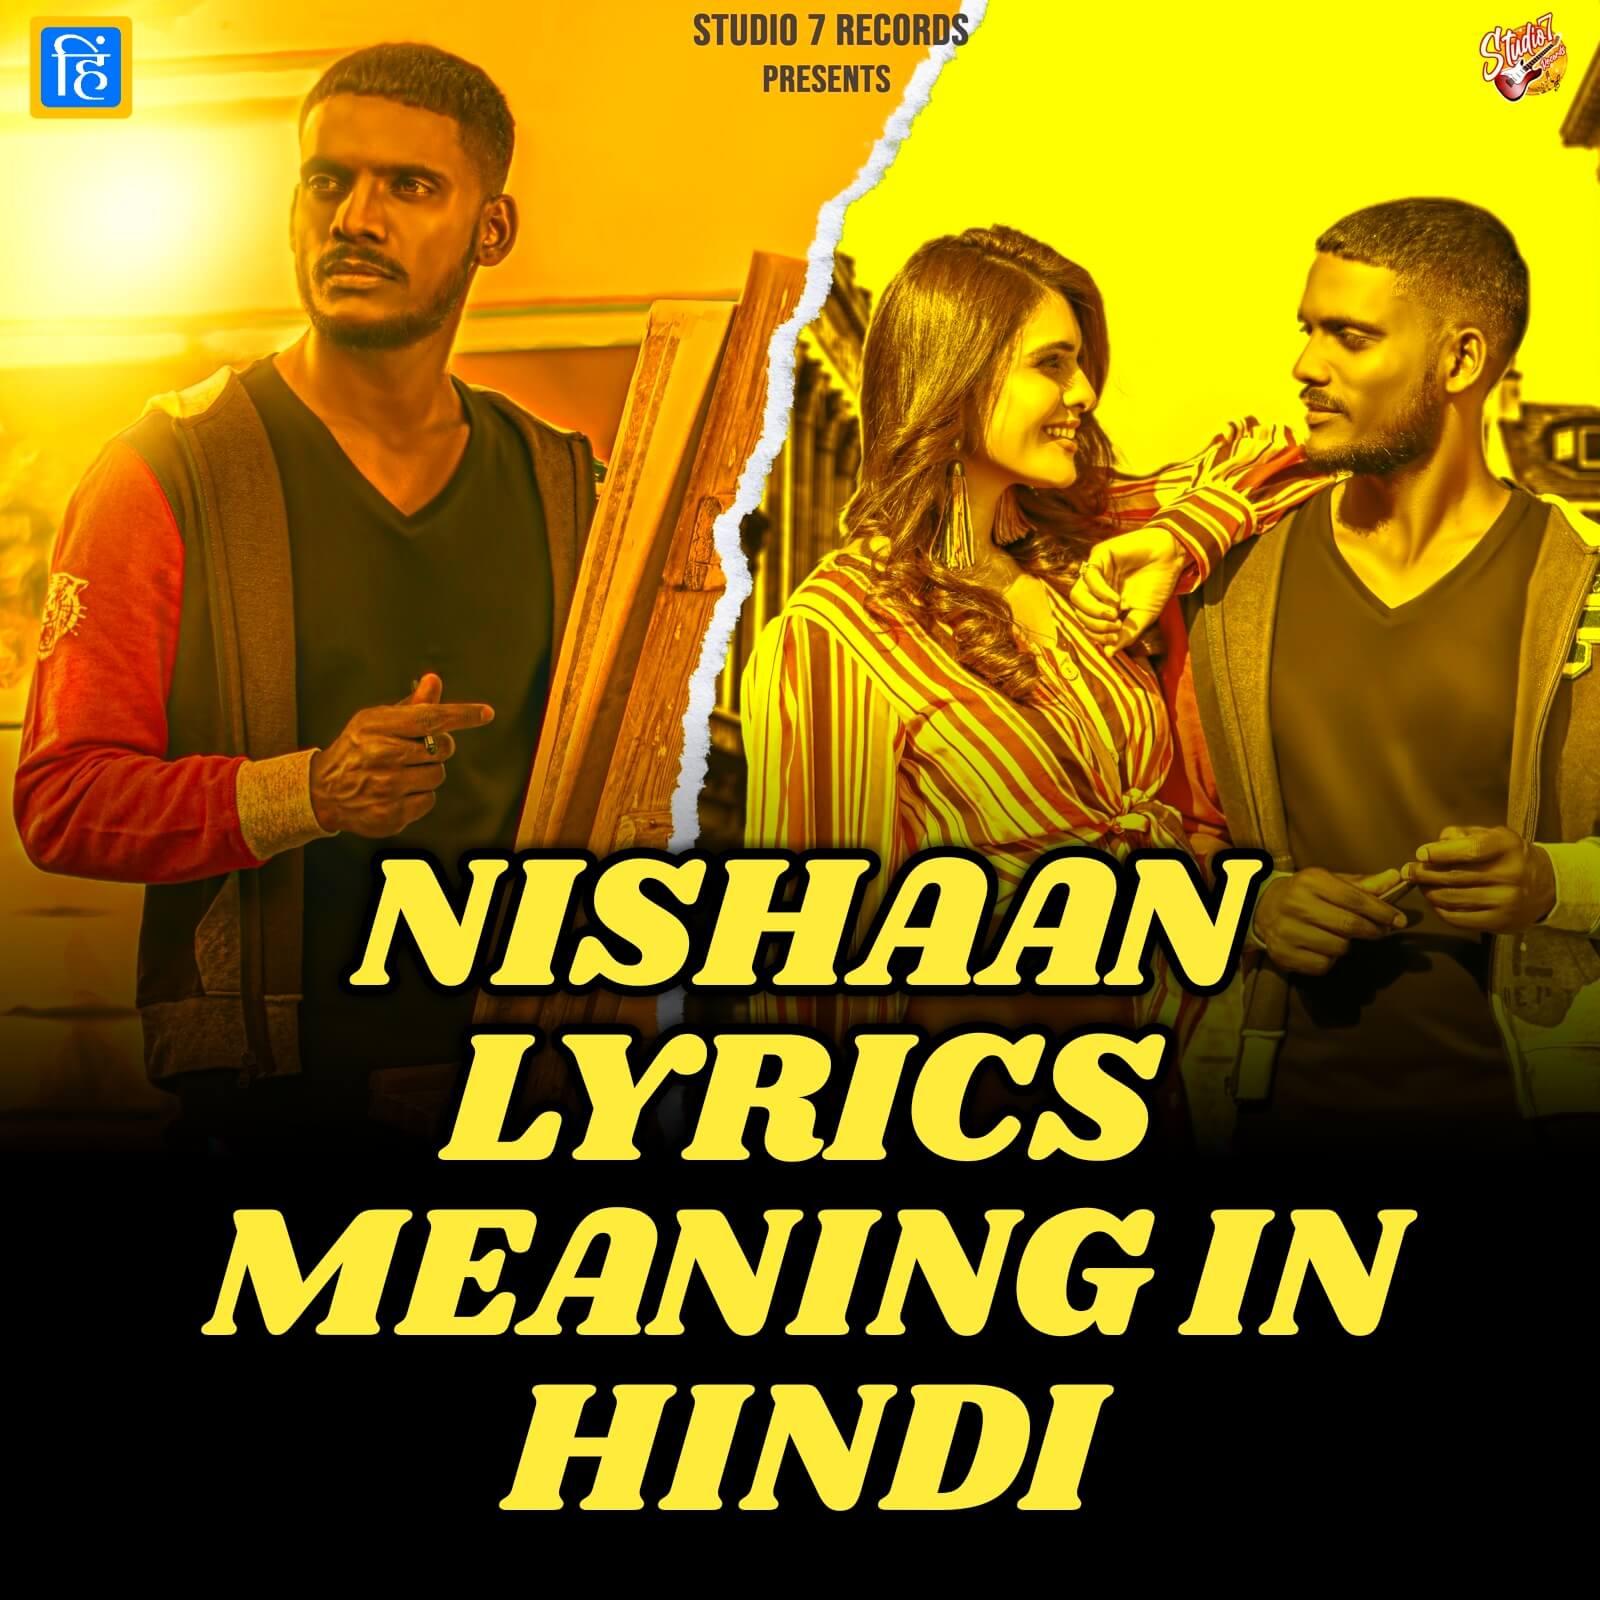 Nishaan Song Lyrics Meaning (translation) In Hindi by Kaka and Deep Prince